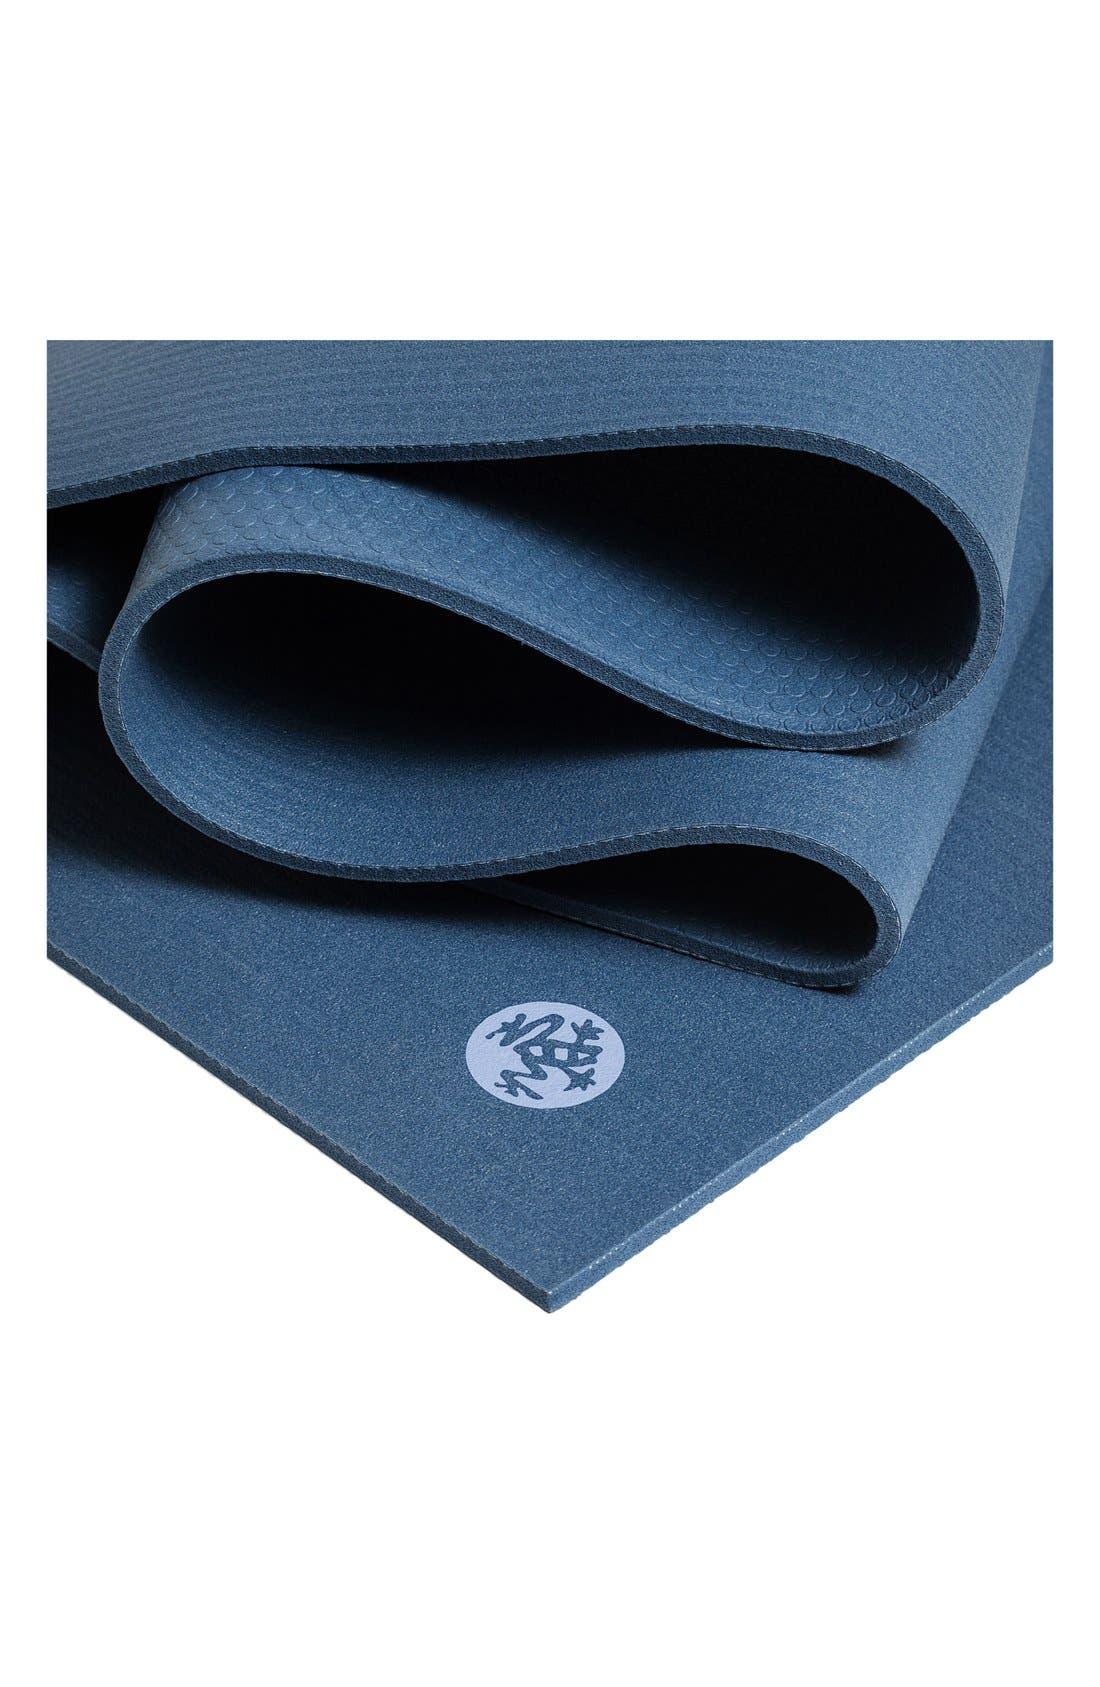 'PRO71 - Odyssey' Yoga Mat,                             Alternate thumbnail 4, color,                             401